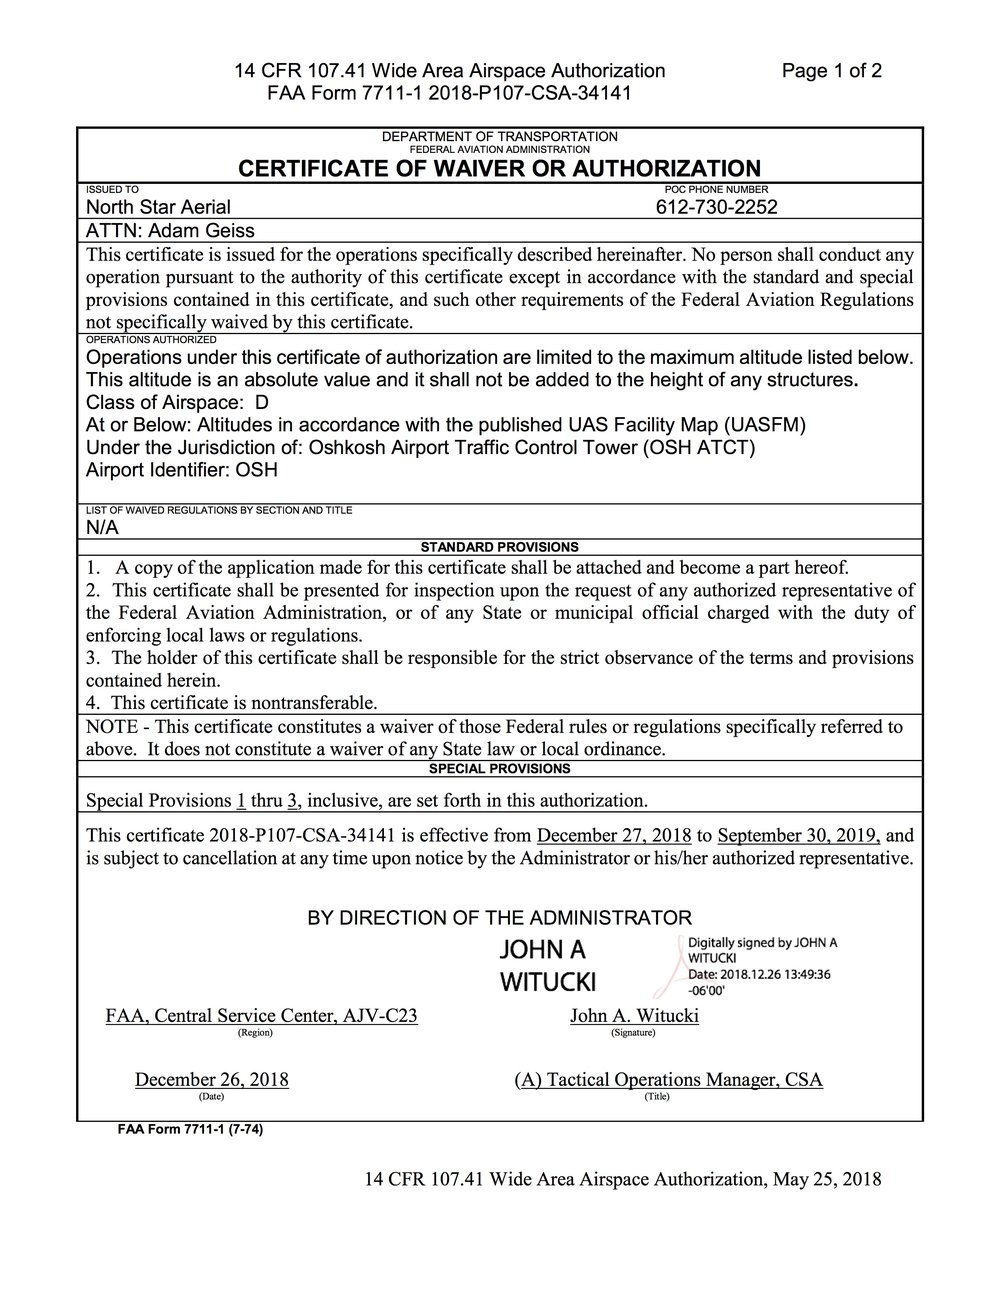 FAA Form 7711-1 2018-P107-CSA-34141 OSH.jpg